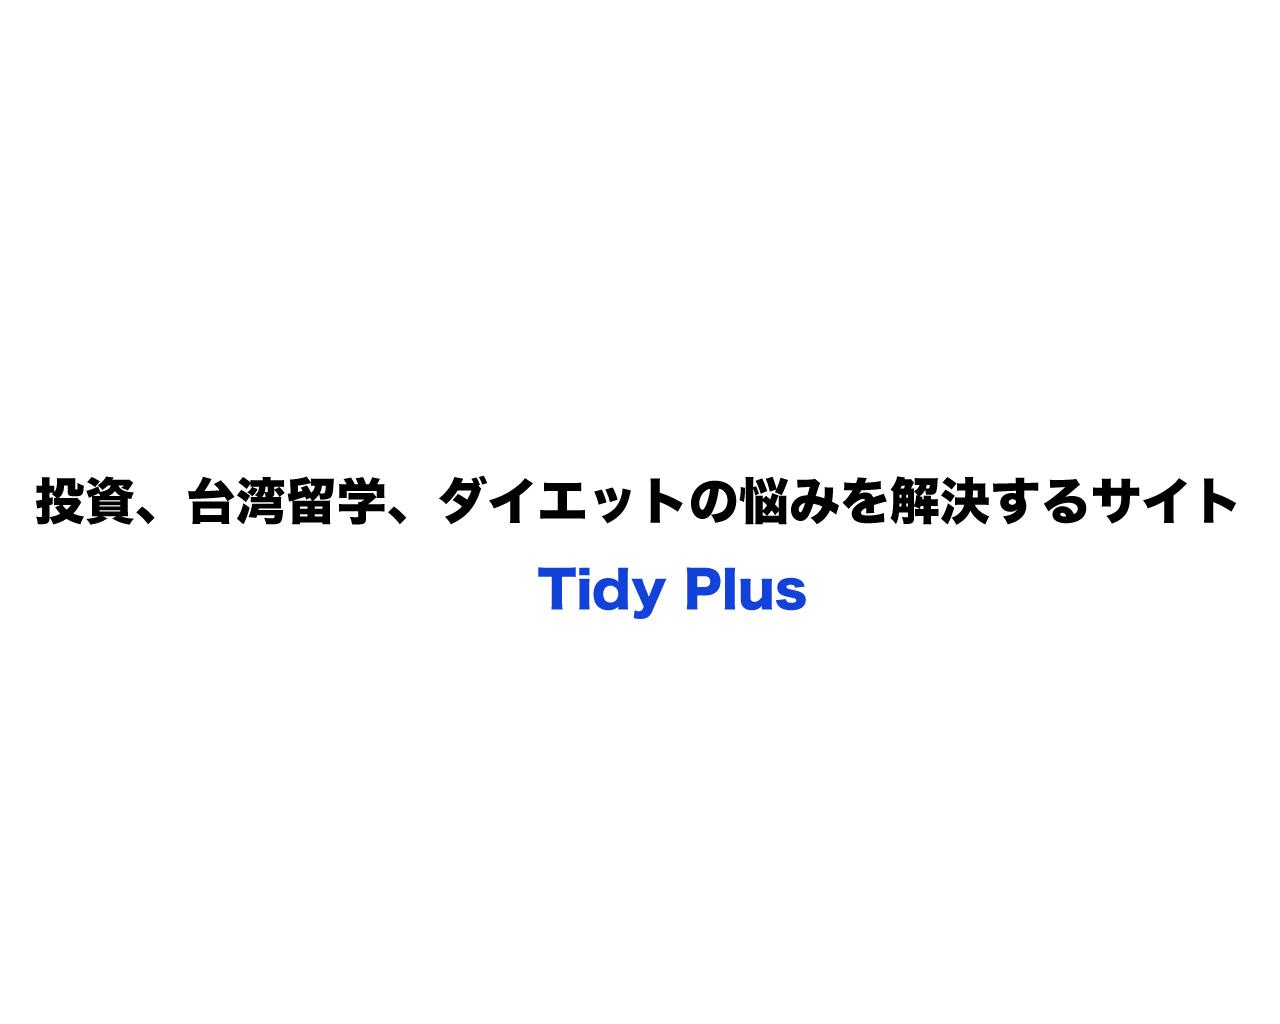 Tidy Plus